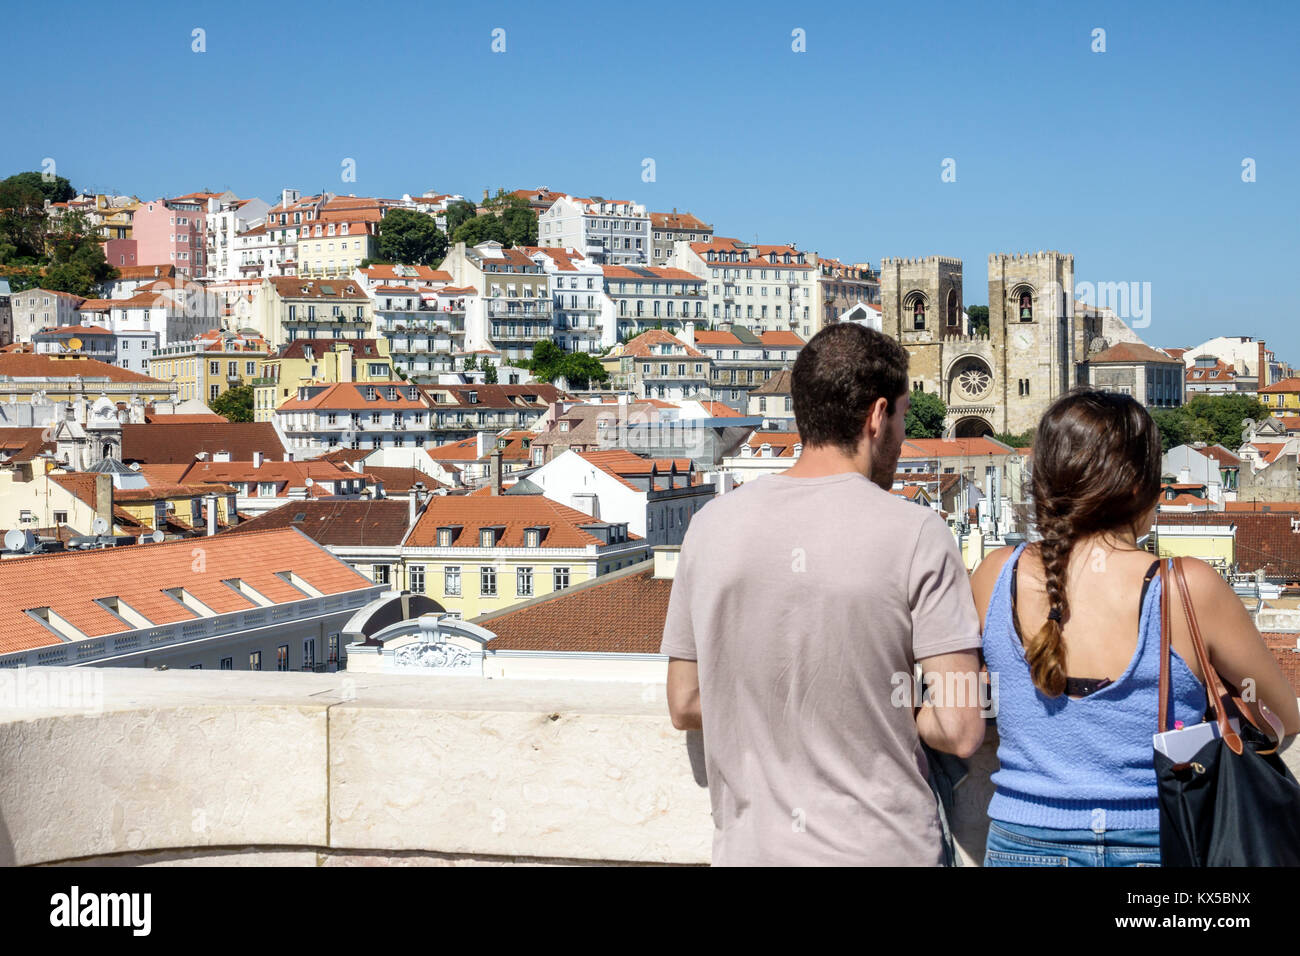 Lisbon Portugal Baixa Chiado historic center Arco da Rua Augusta arch viewing platform man woman couple city skyline - Stock Image